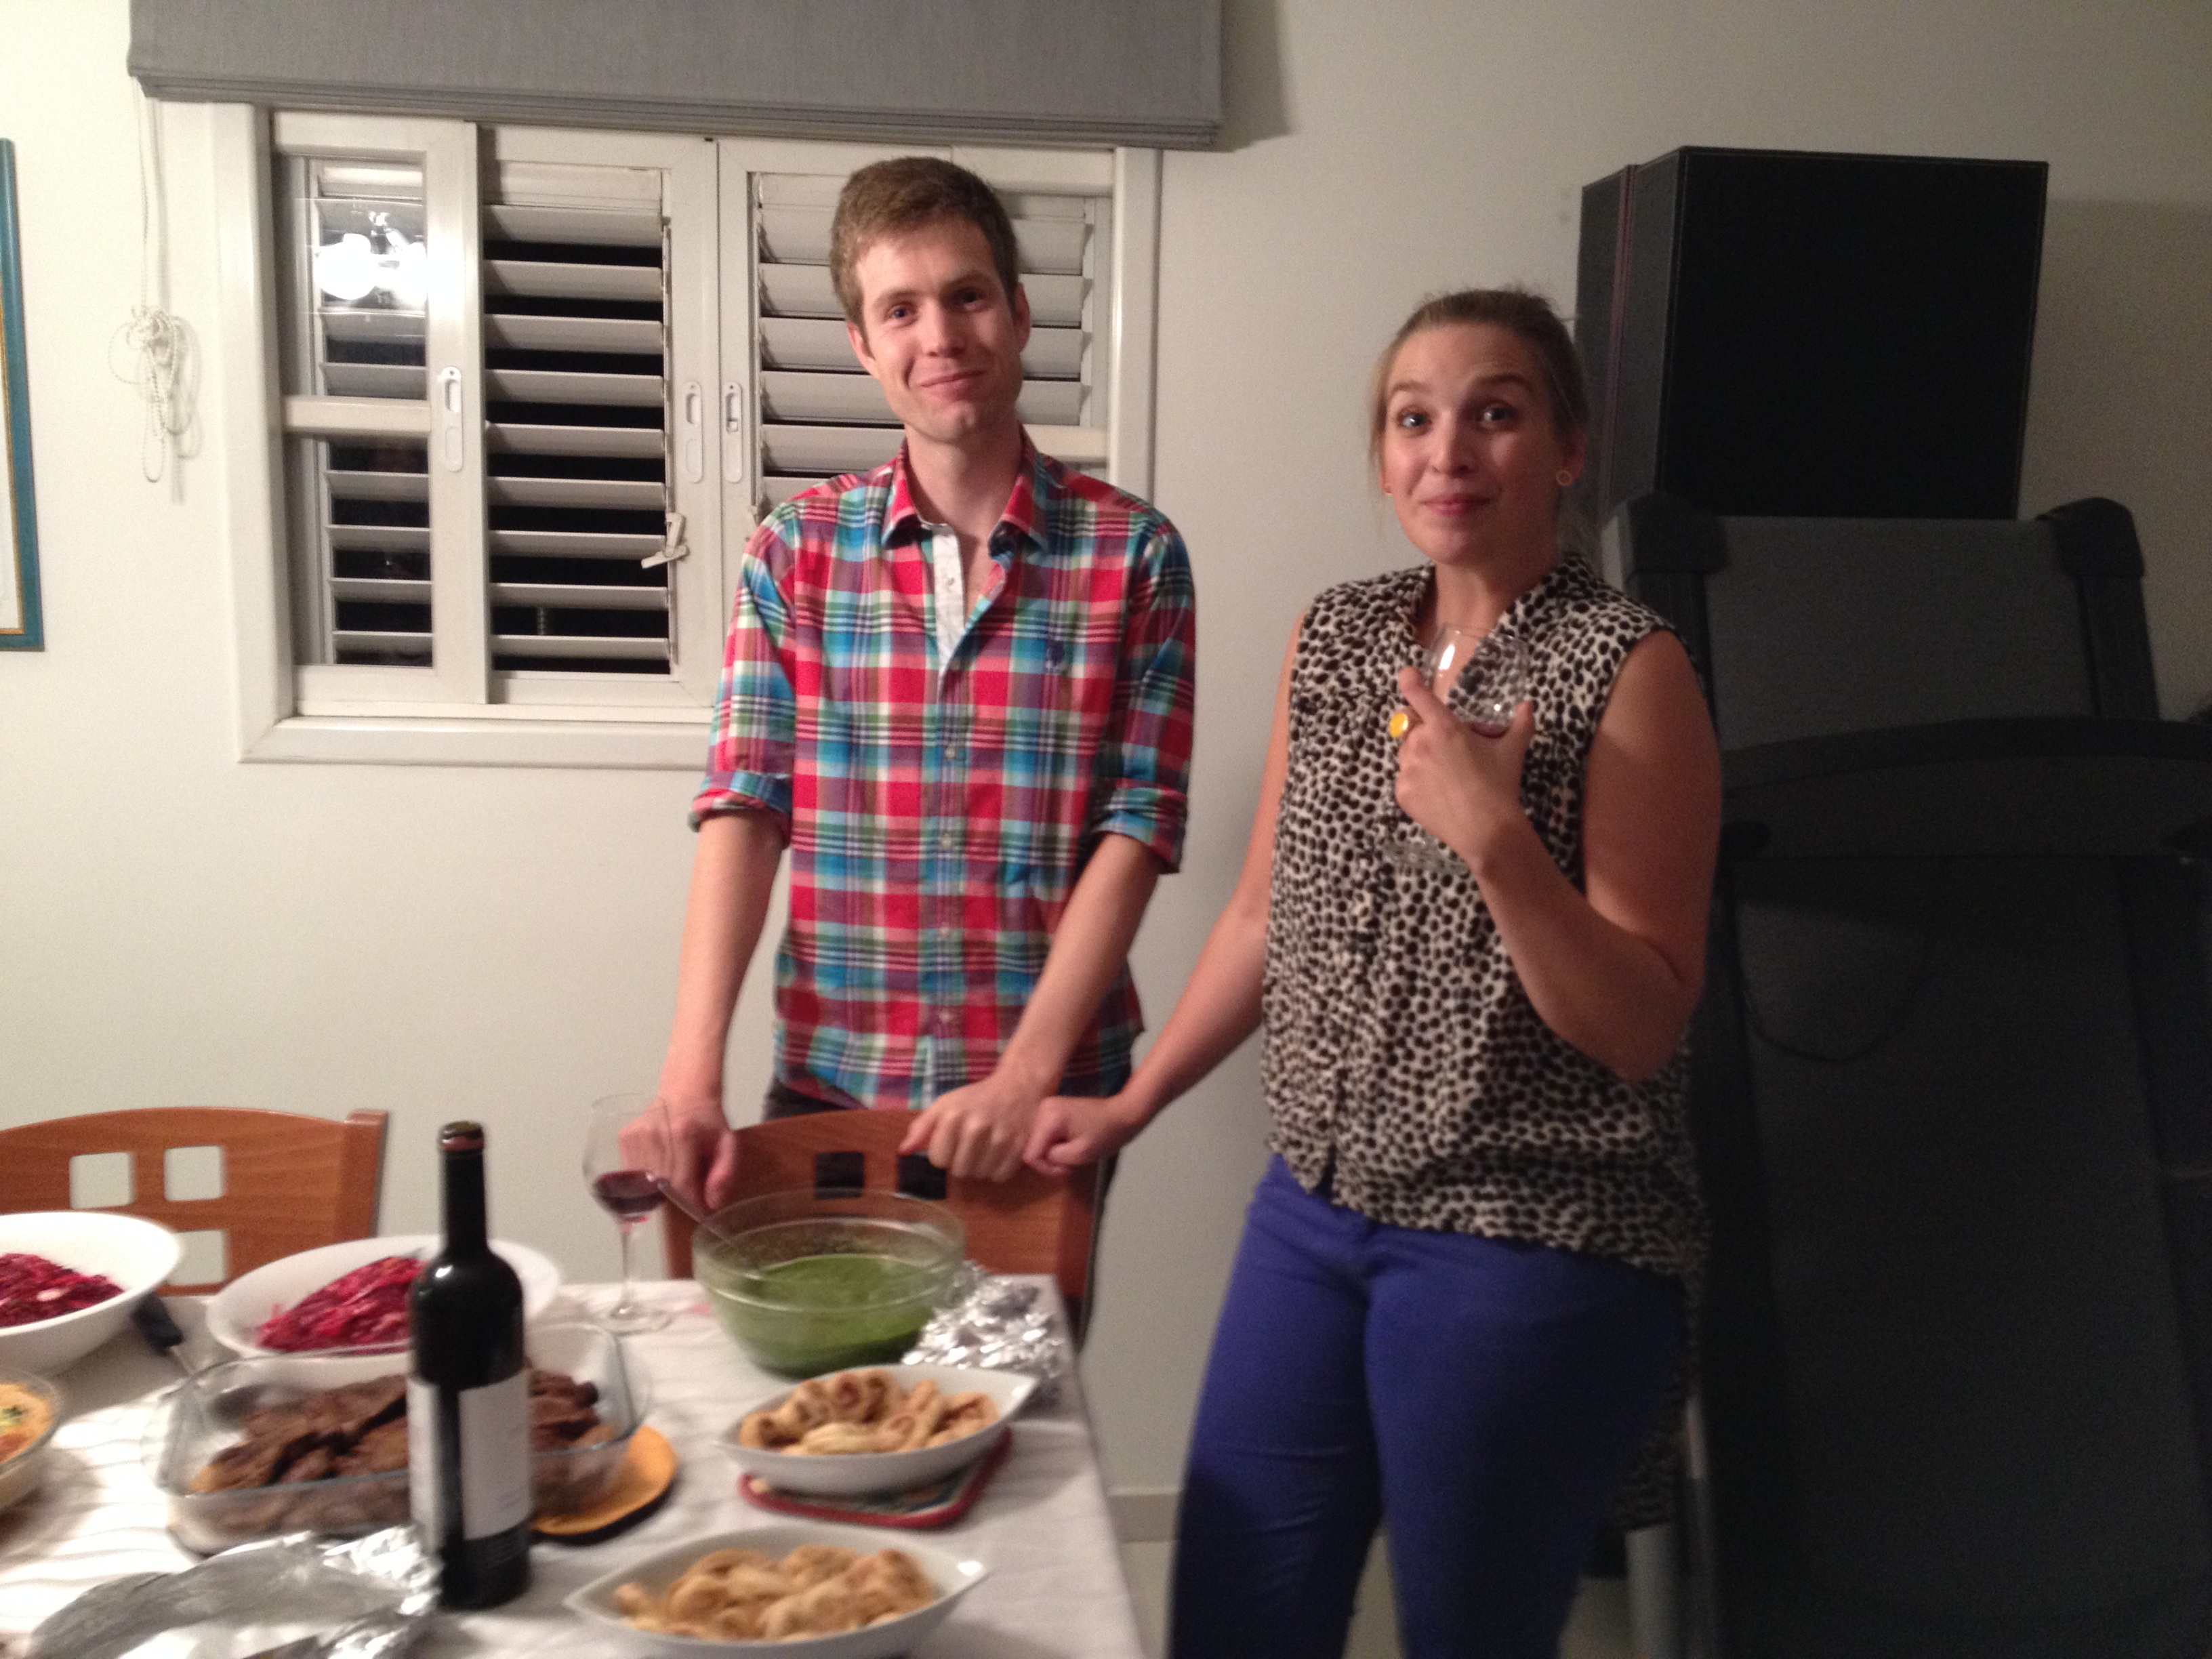 Chris & Tanya celebrating fellowship